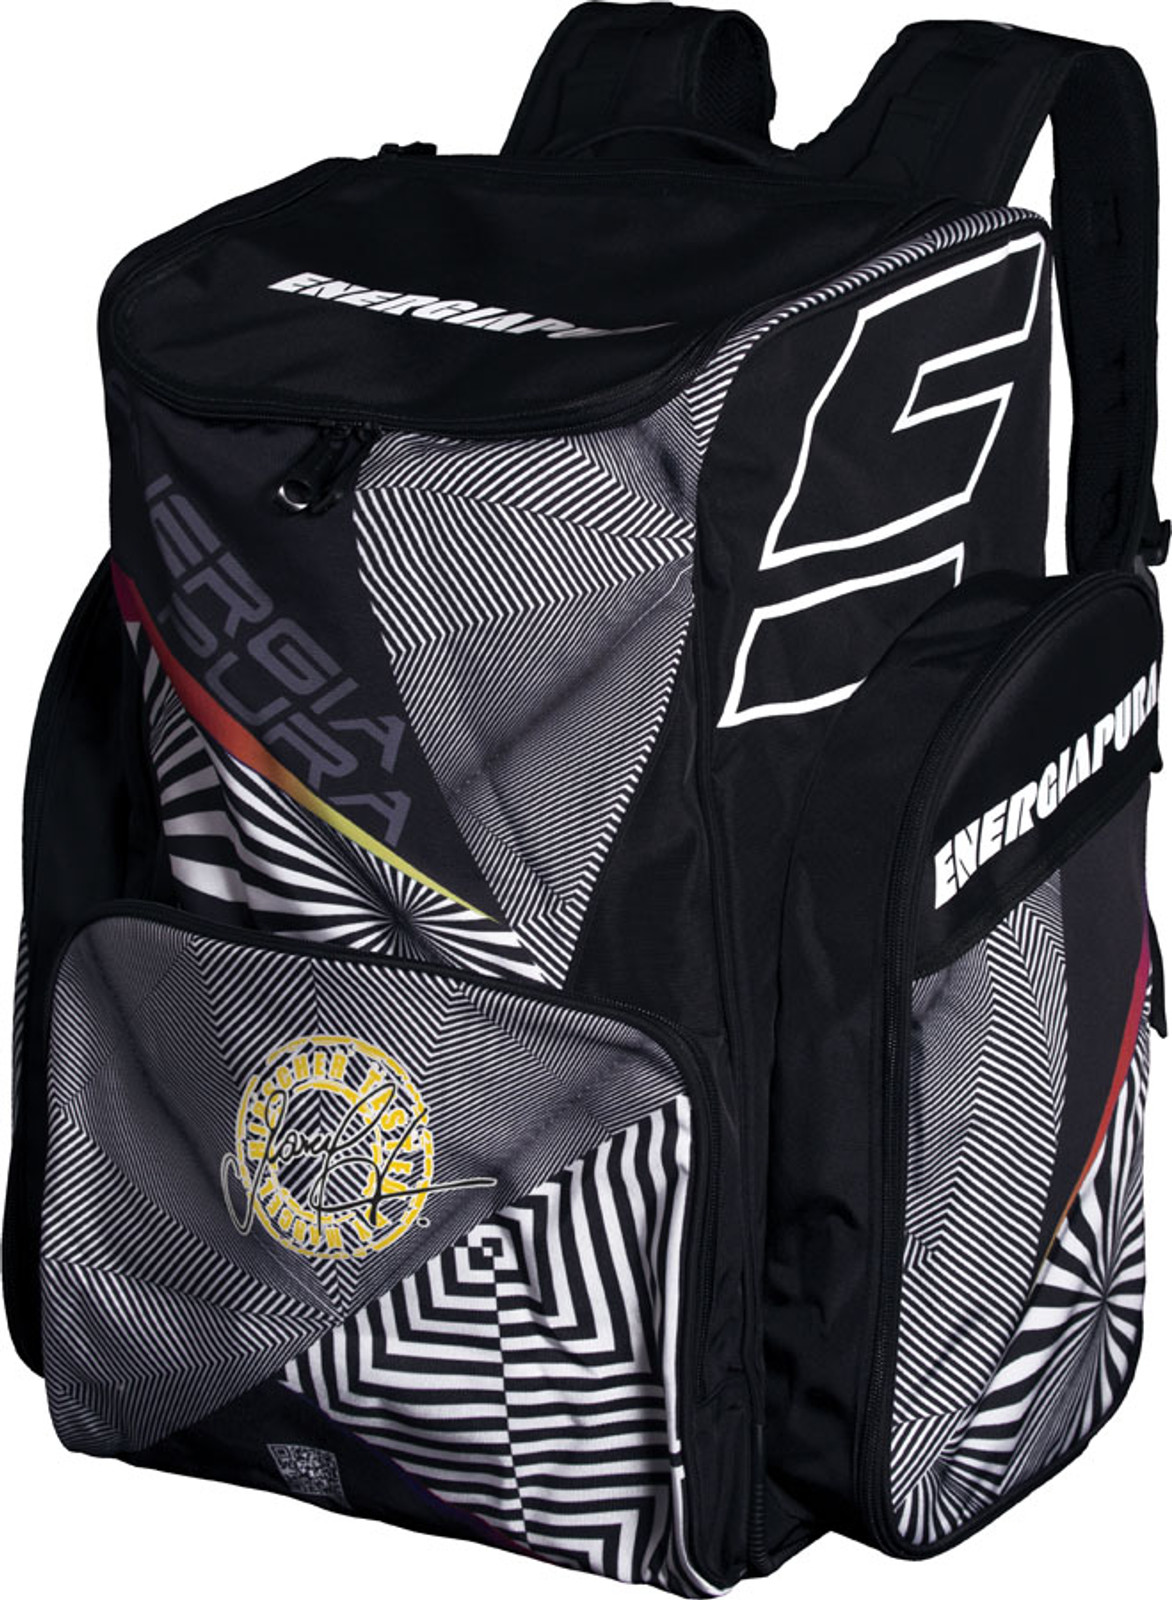 Energiapura Racer Bags!